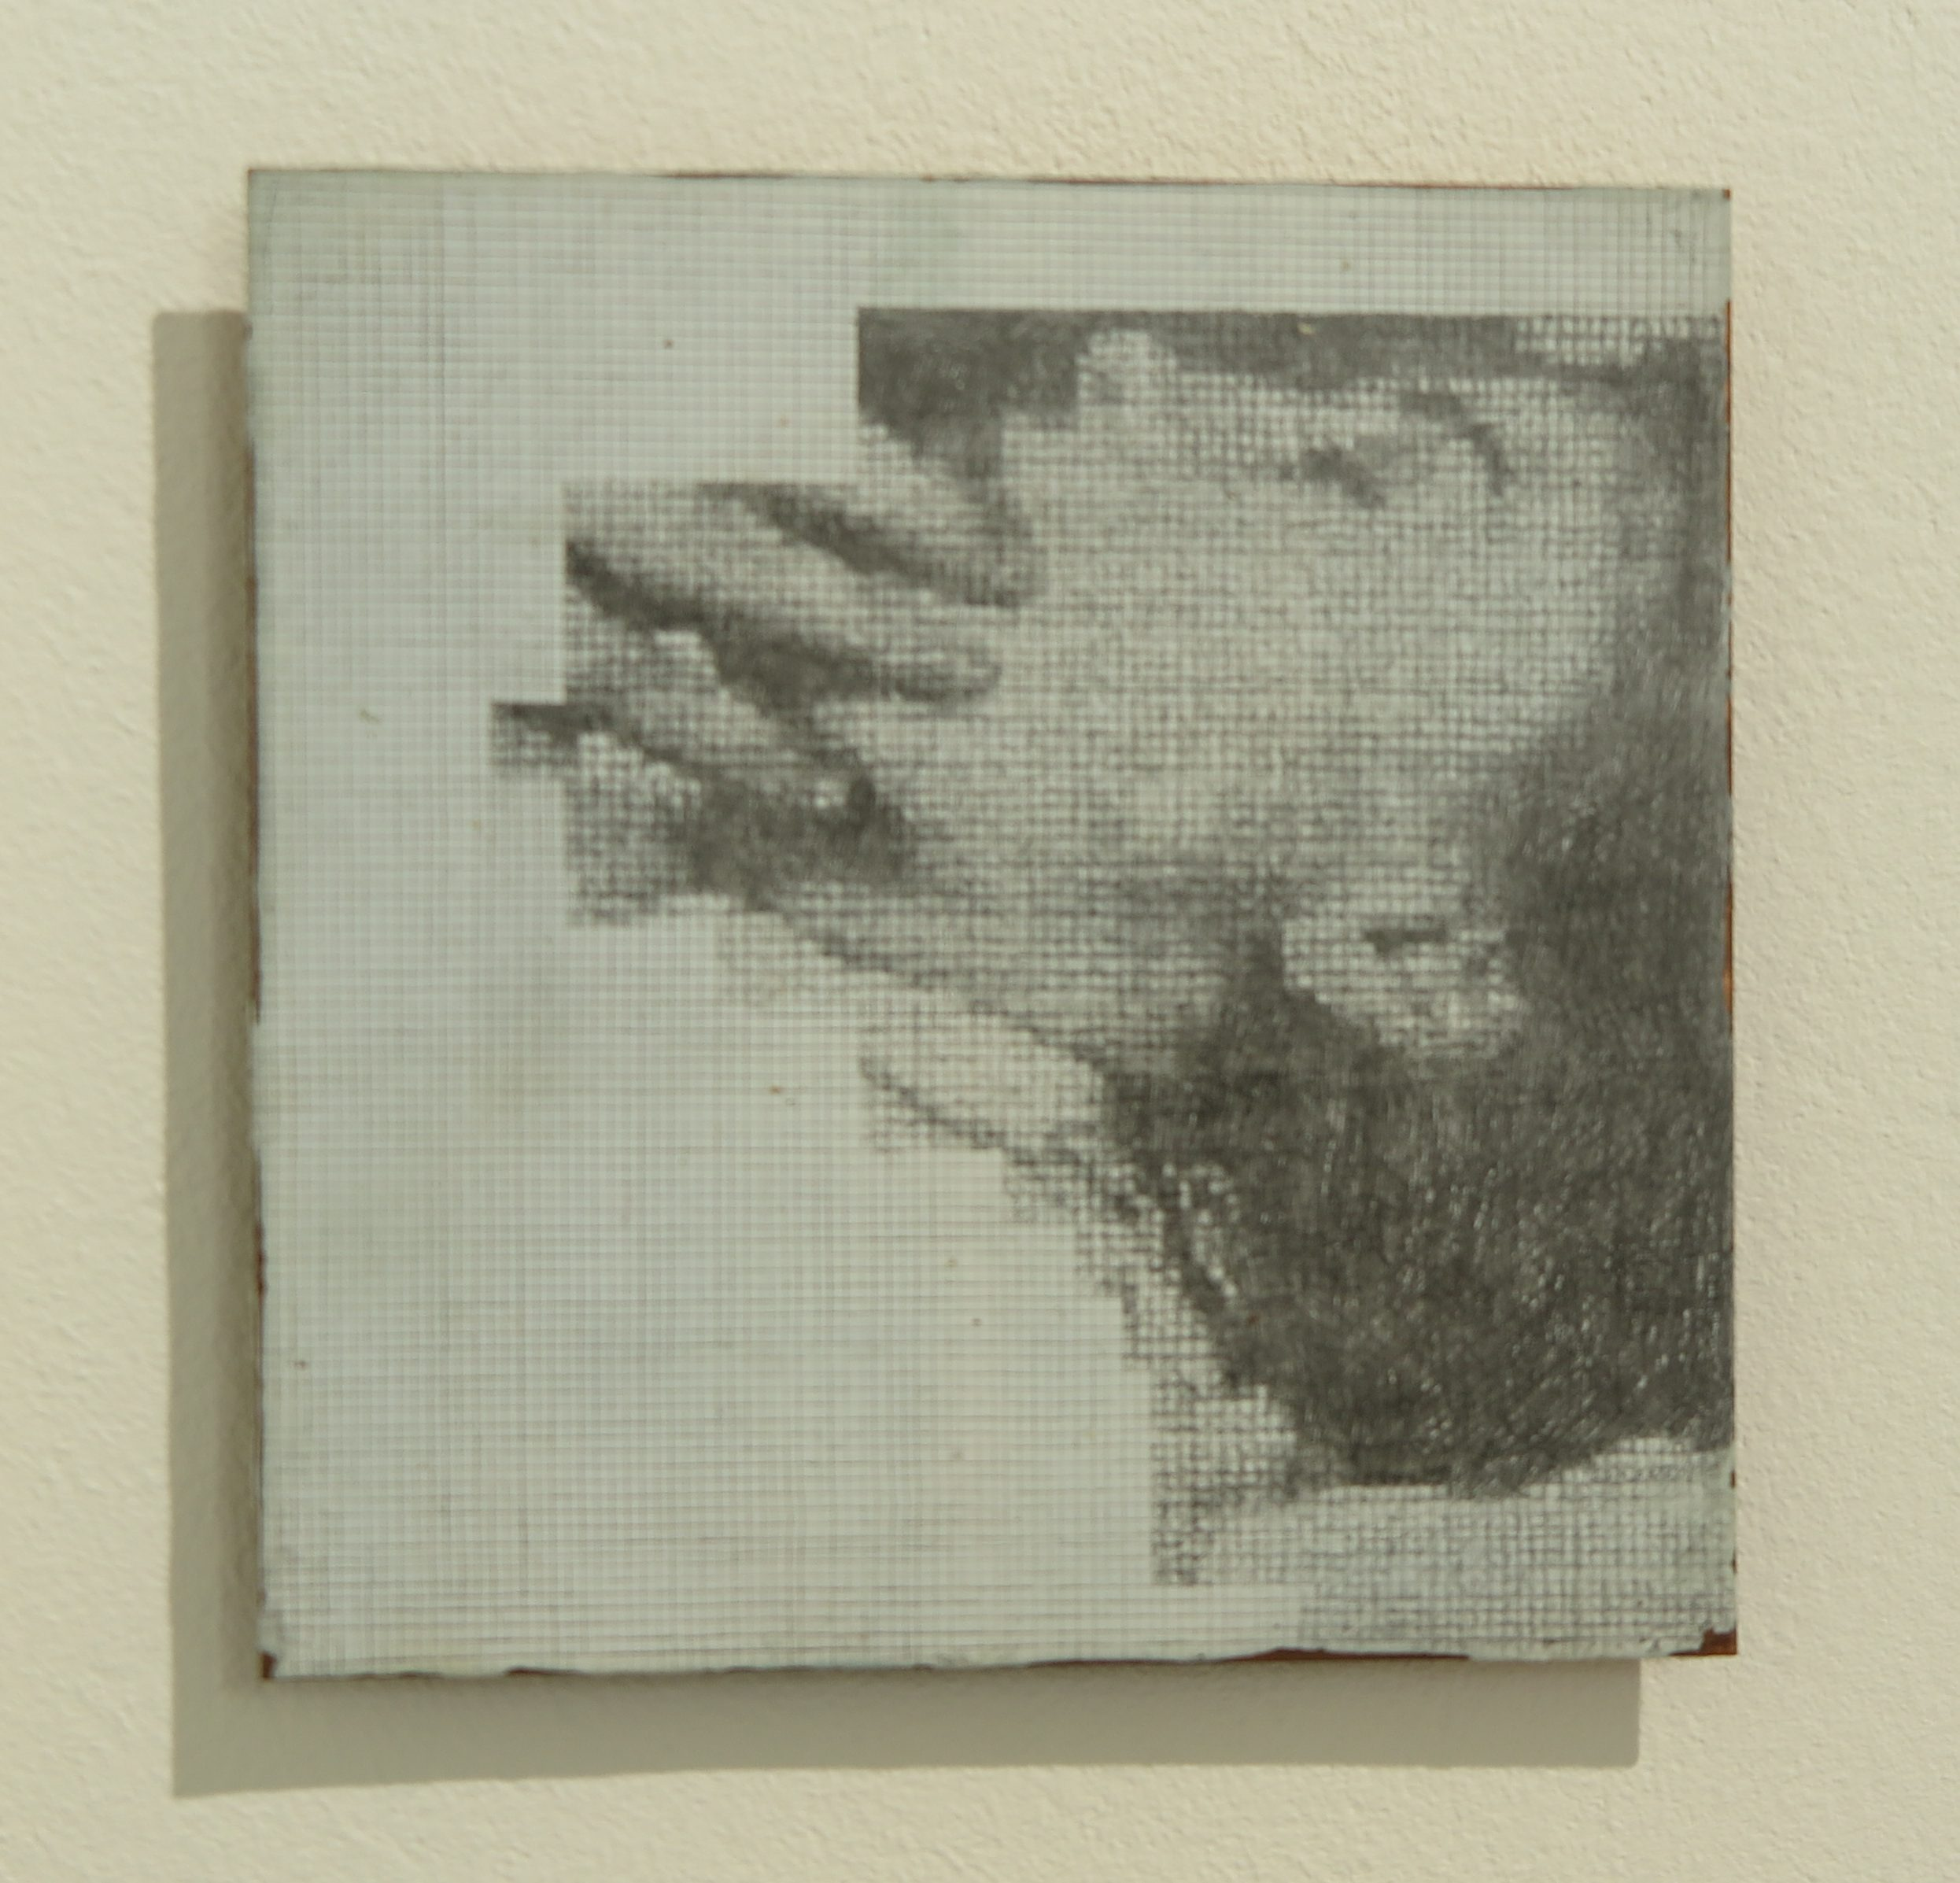 Sylvie de Meerleer - A distance t(o) close